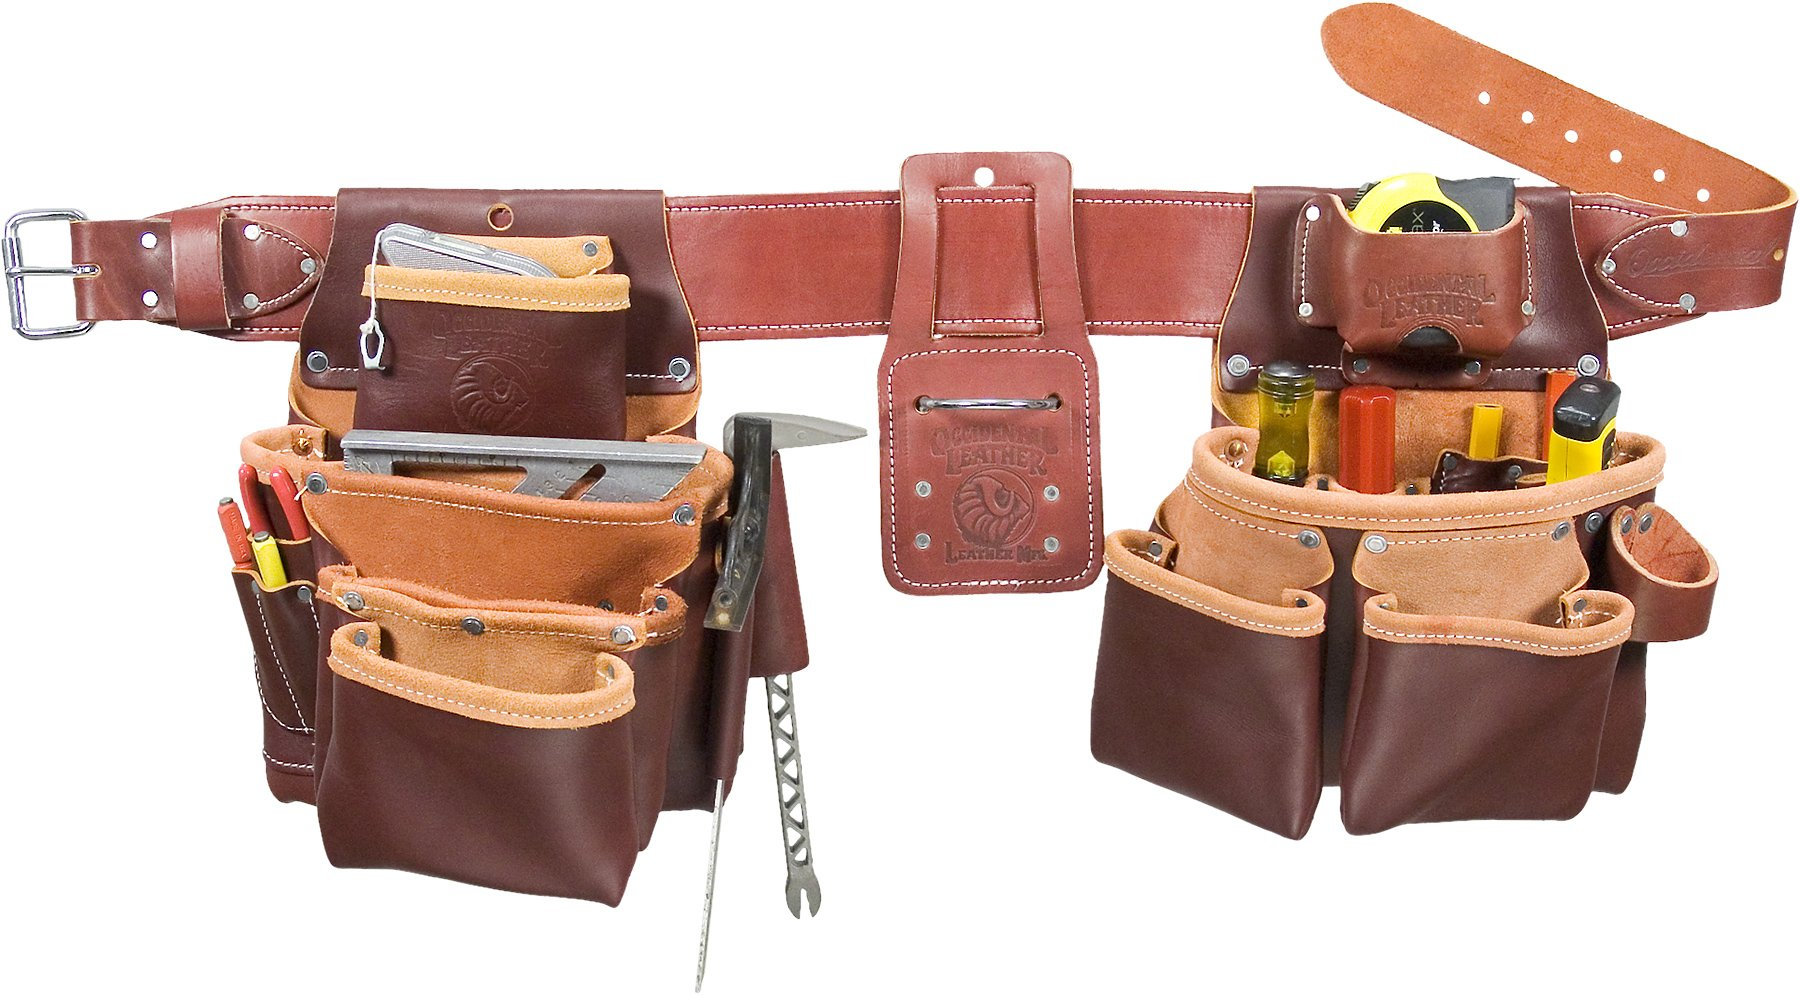 Occidental Leather 5089 LG Seven Bag Framer by Occidental Leather